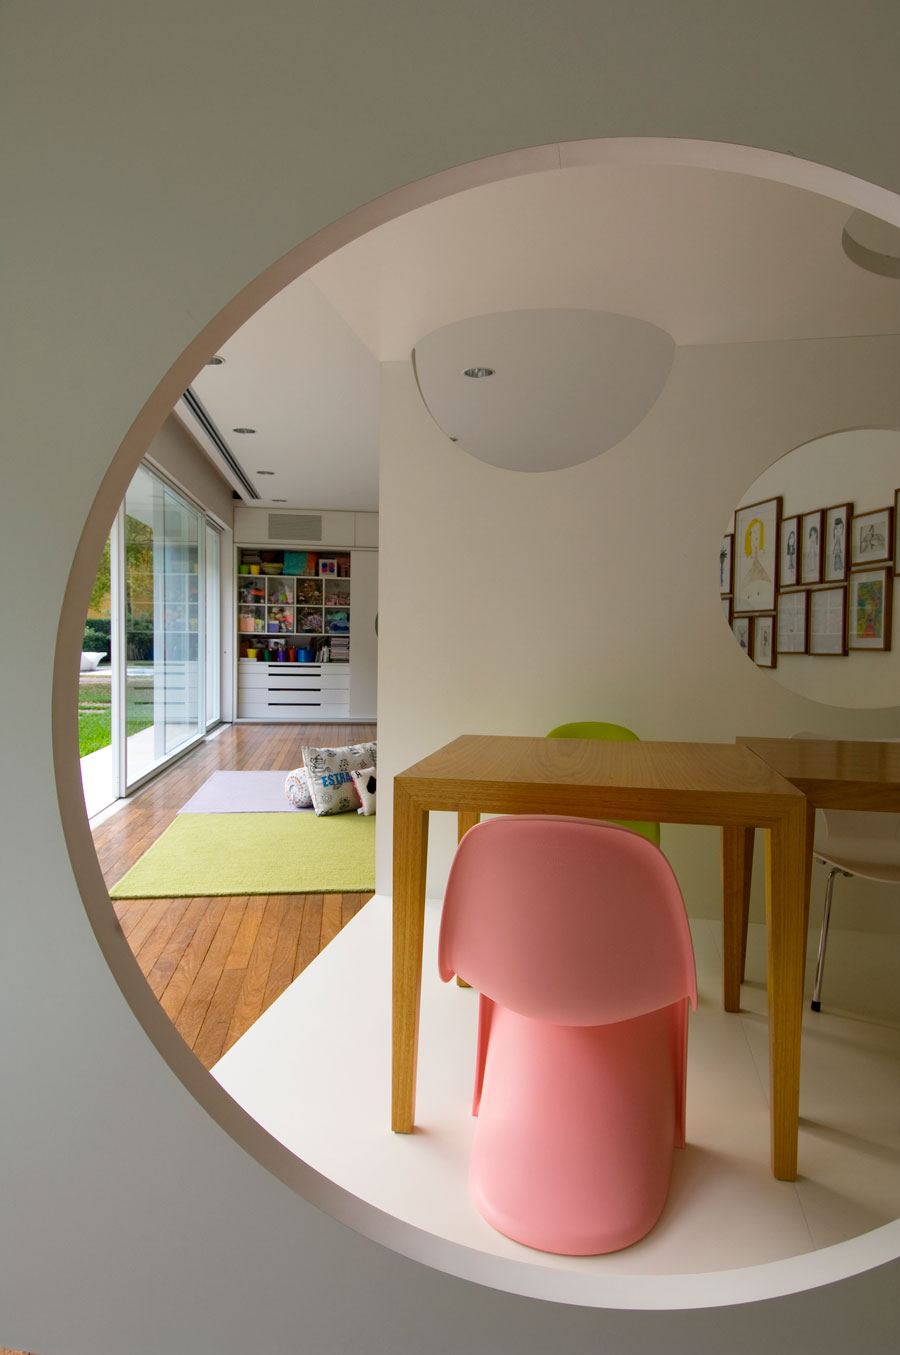 l 39 histoire de la boite dans la boite frenchyfancy 2. Black Bedroom Furniture Sets. Home Design Ideas